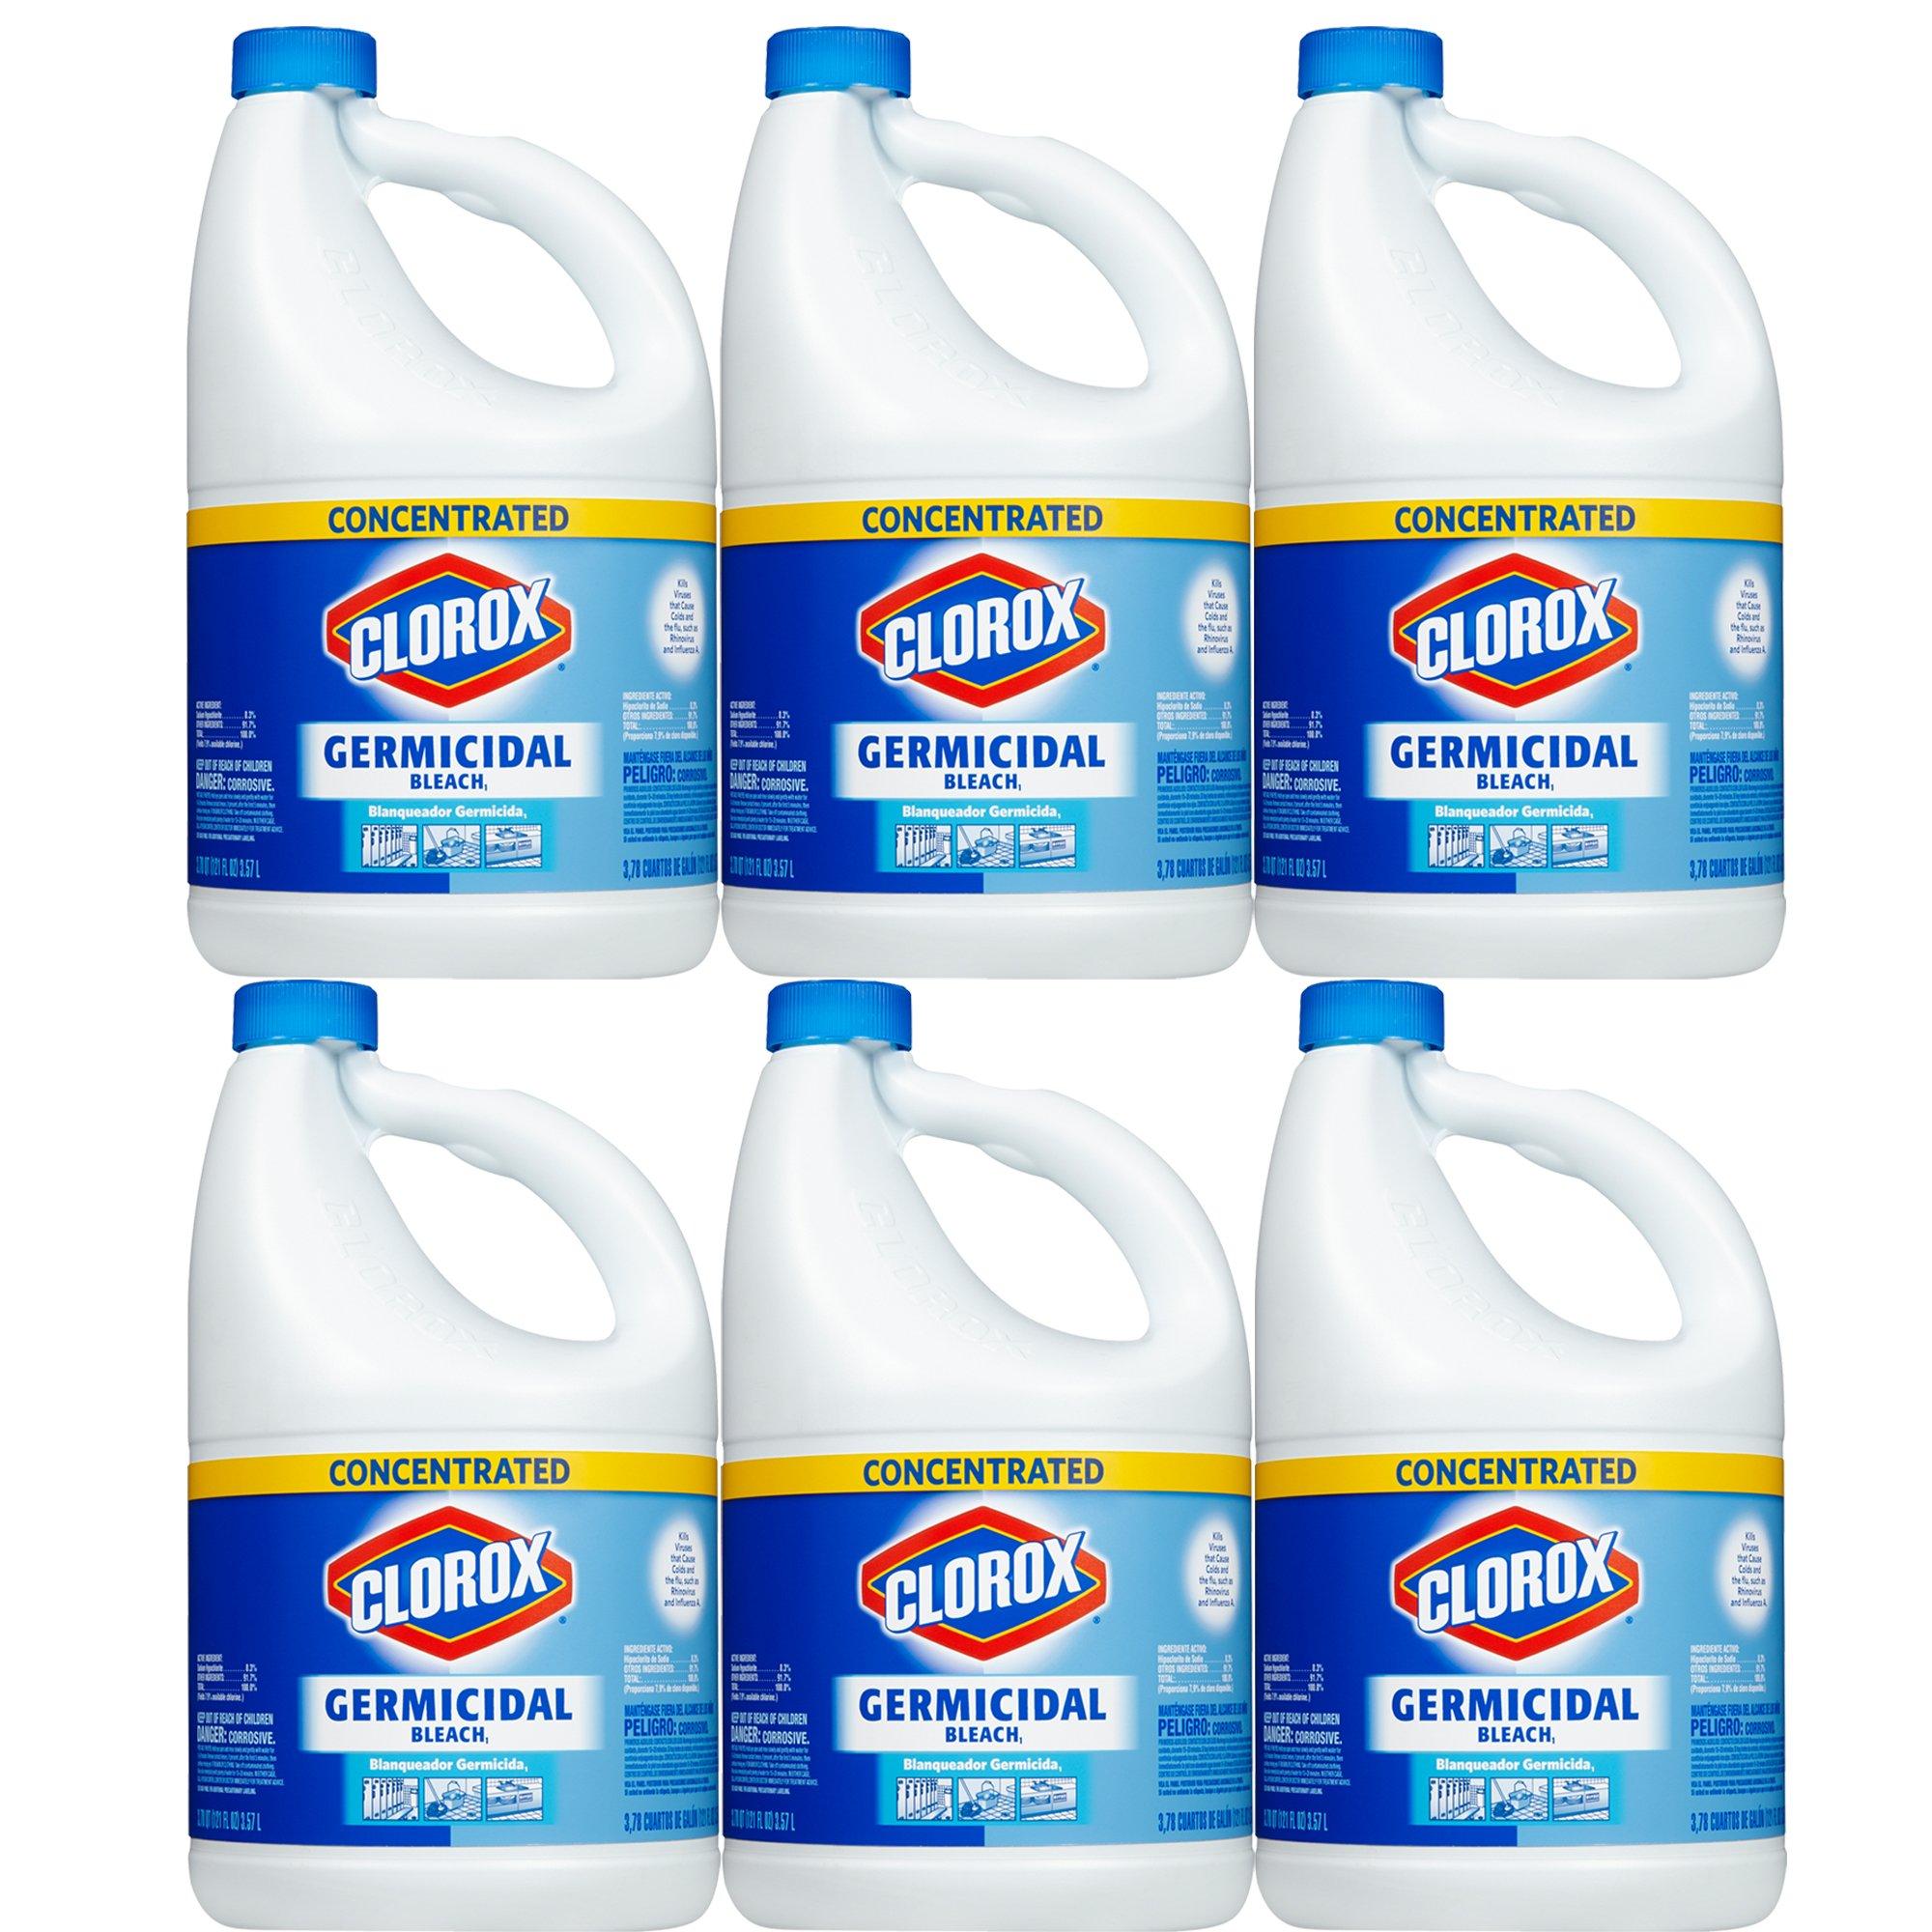 Clorox Germicidal Concentrated Liquid, Germicidal Bleach 121 oz, 6-Pack